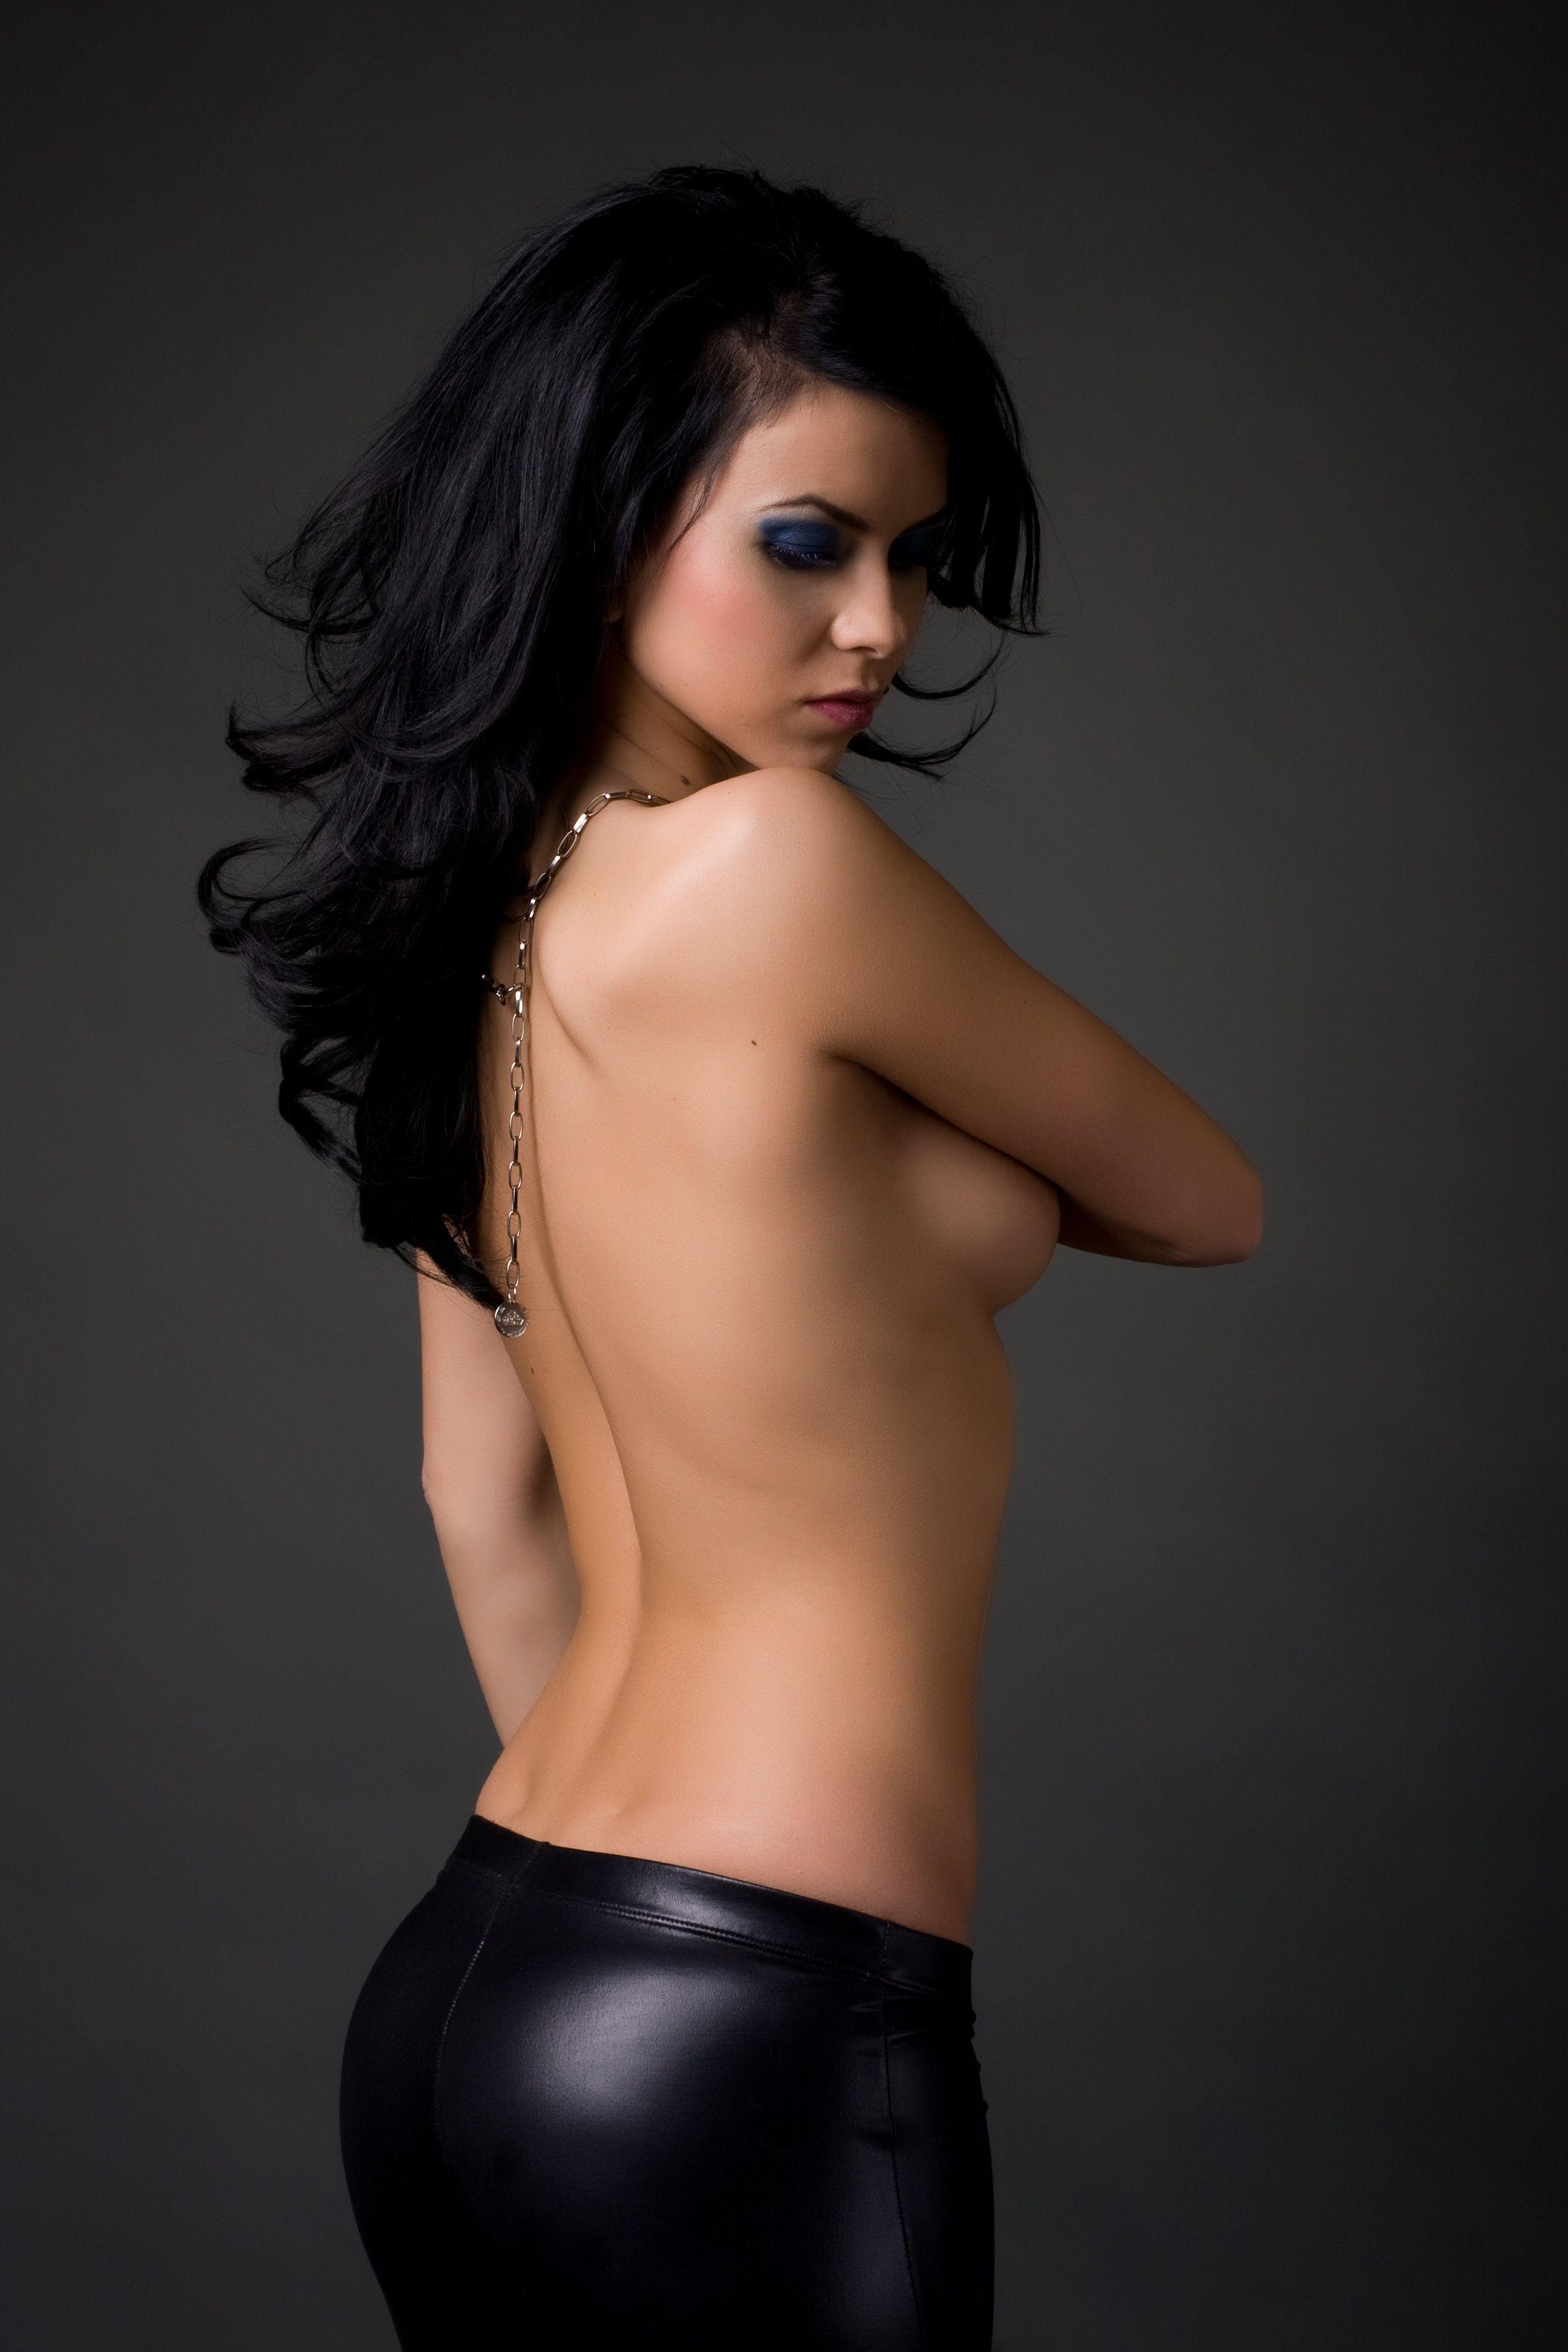 Natalie imbrulia naked